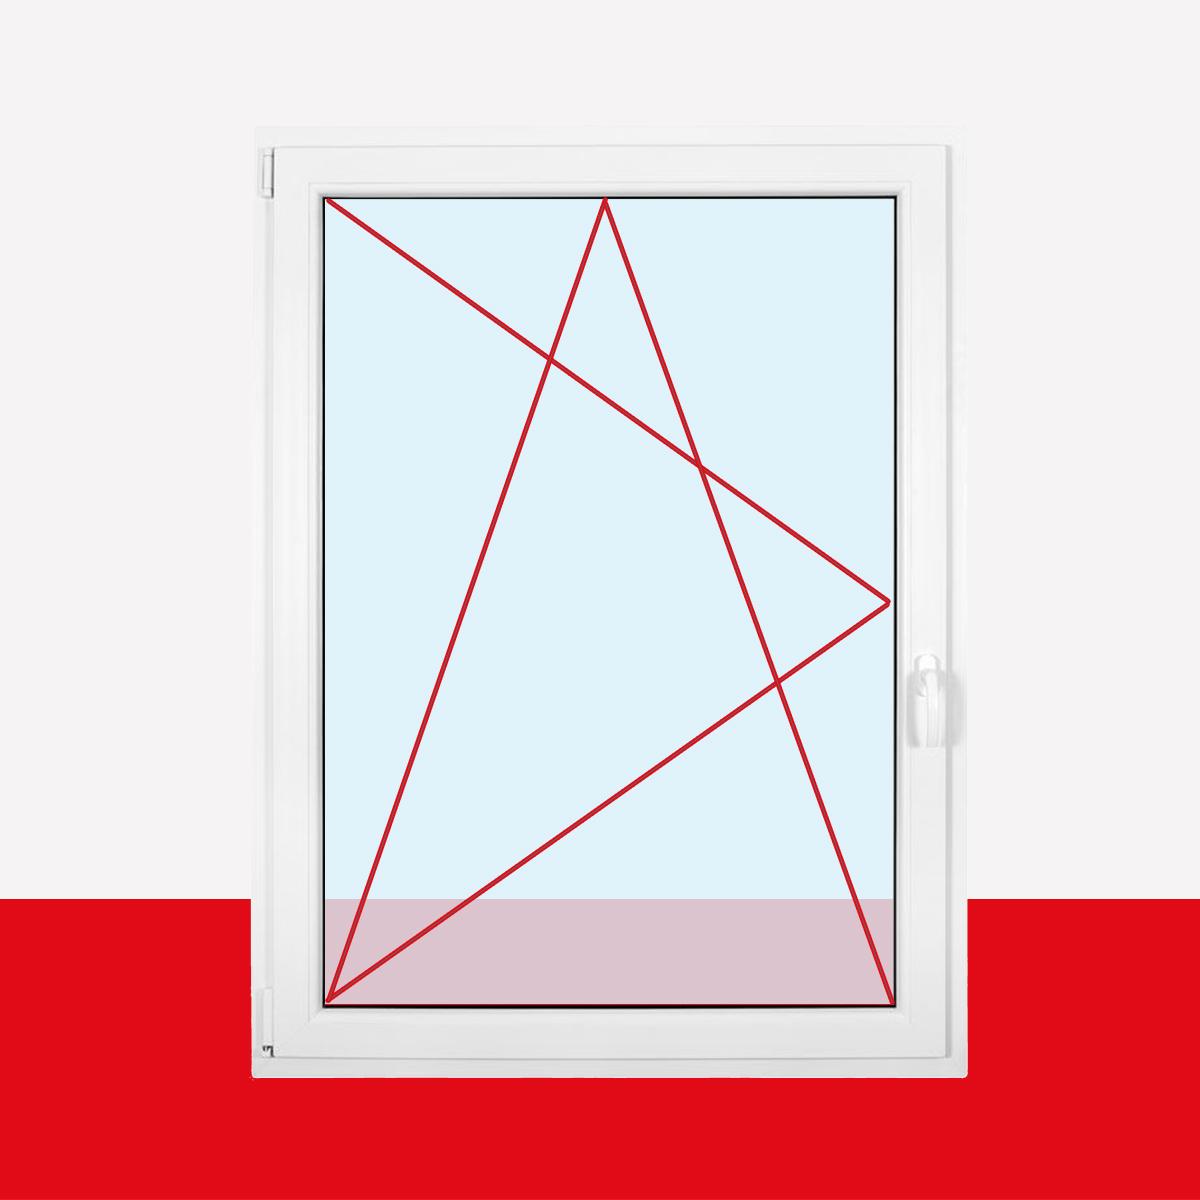 Kunststofffenster Weiss Dreh Kipp 2 Fach 3 Fach Verglasung Alle Grossen Fenstermaxx24